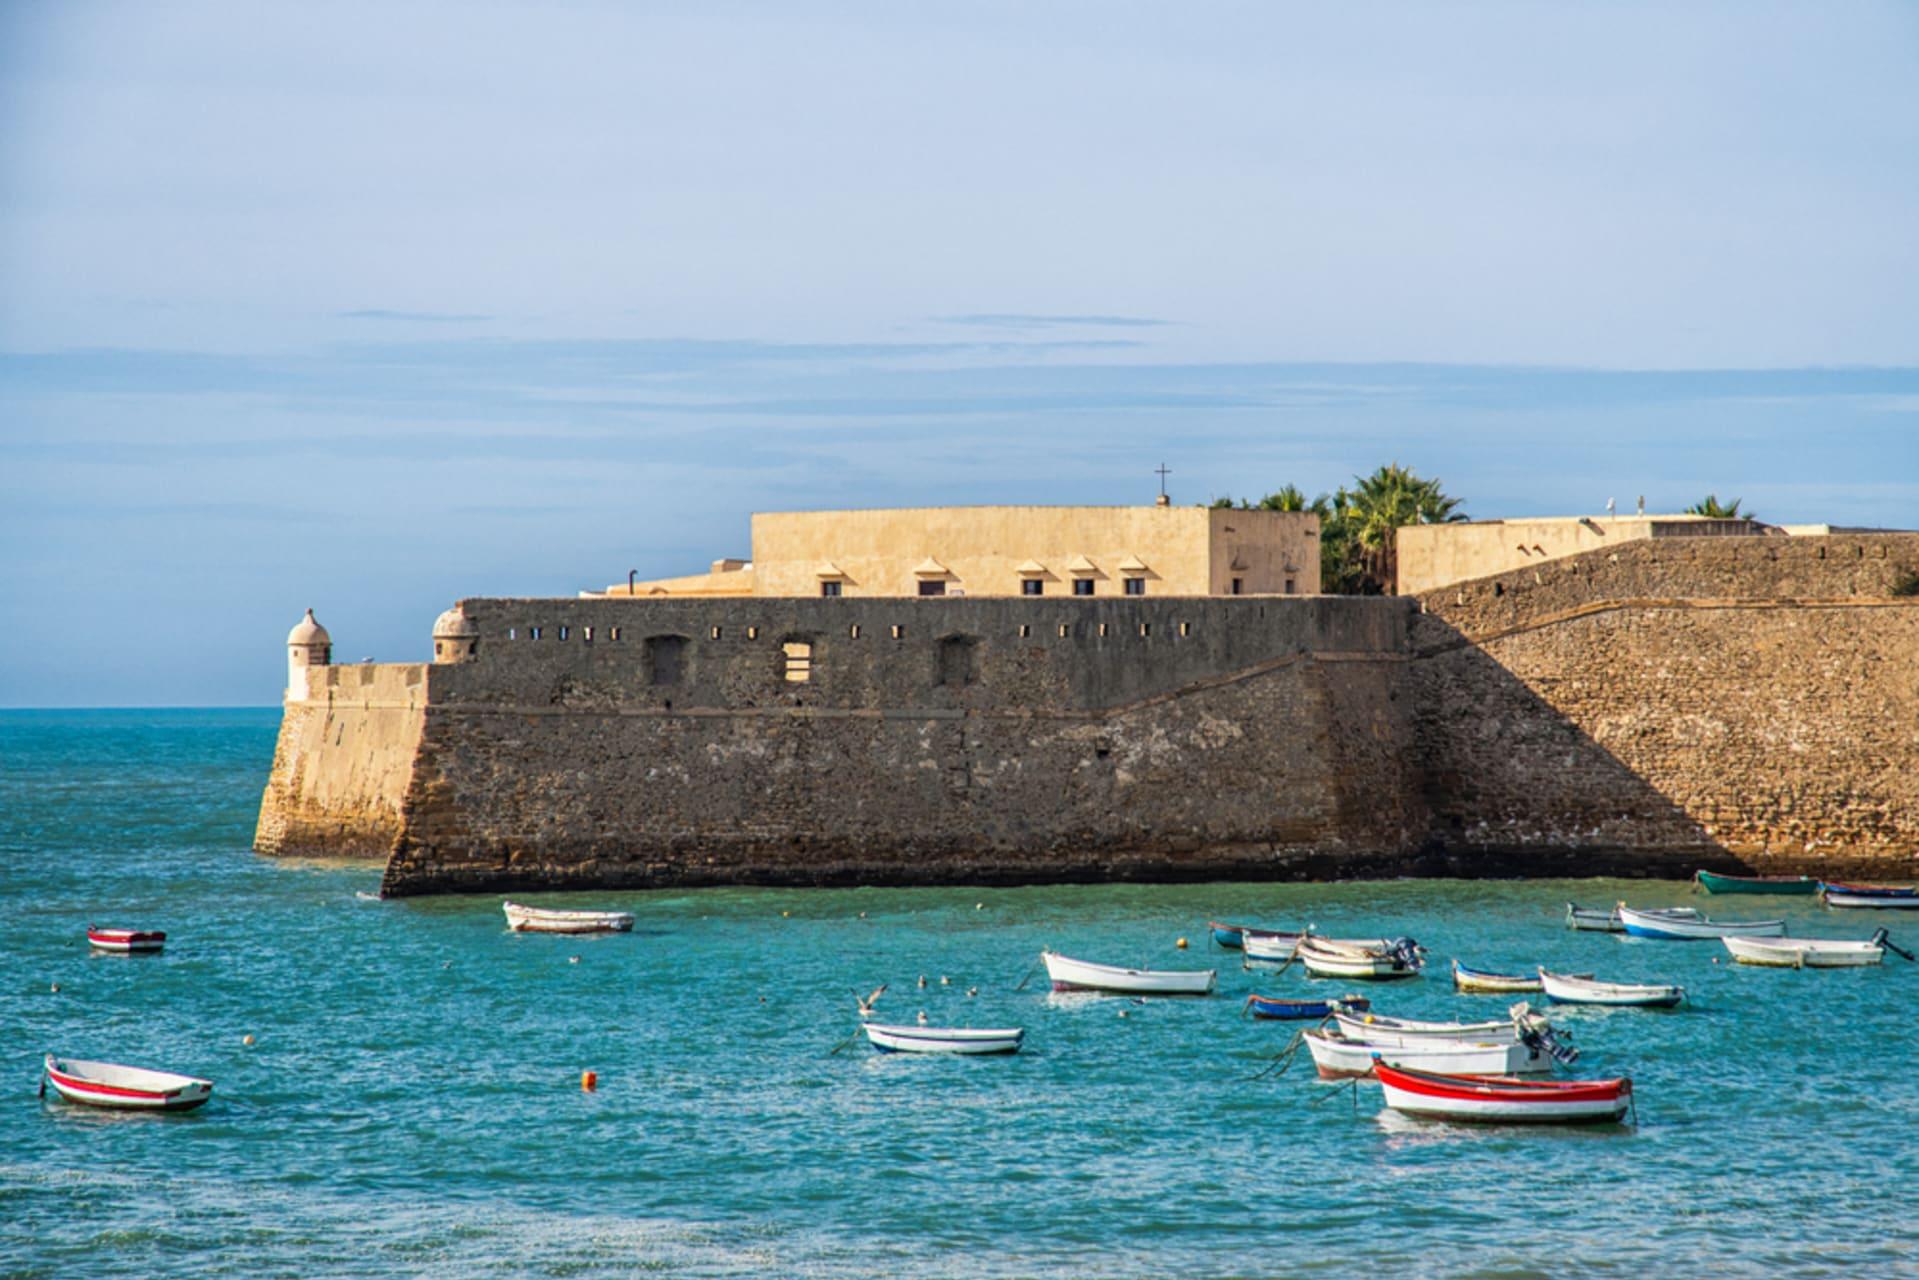 Cádiz - The fortresses of the History of Cádiz, legends and curiosities.